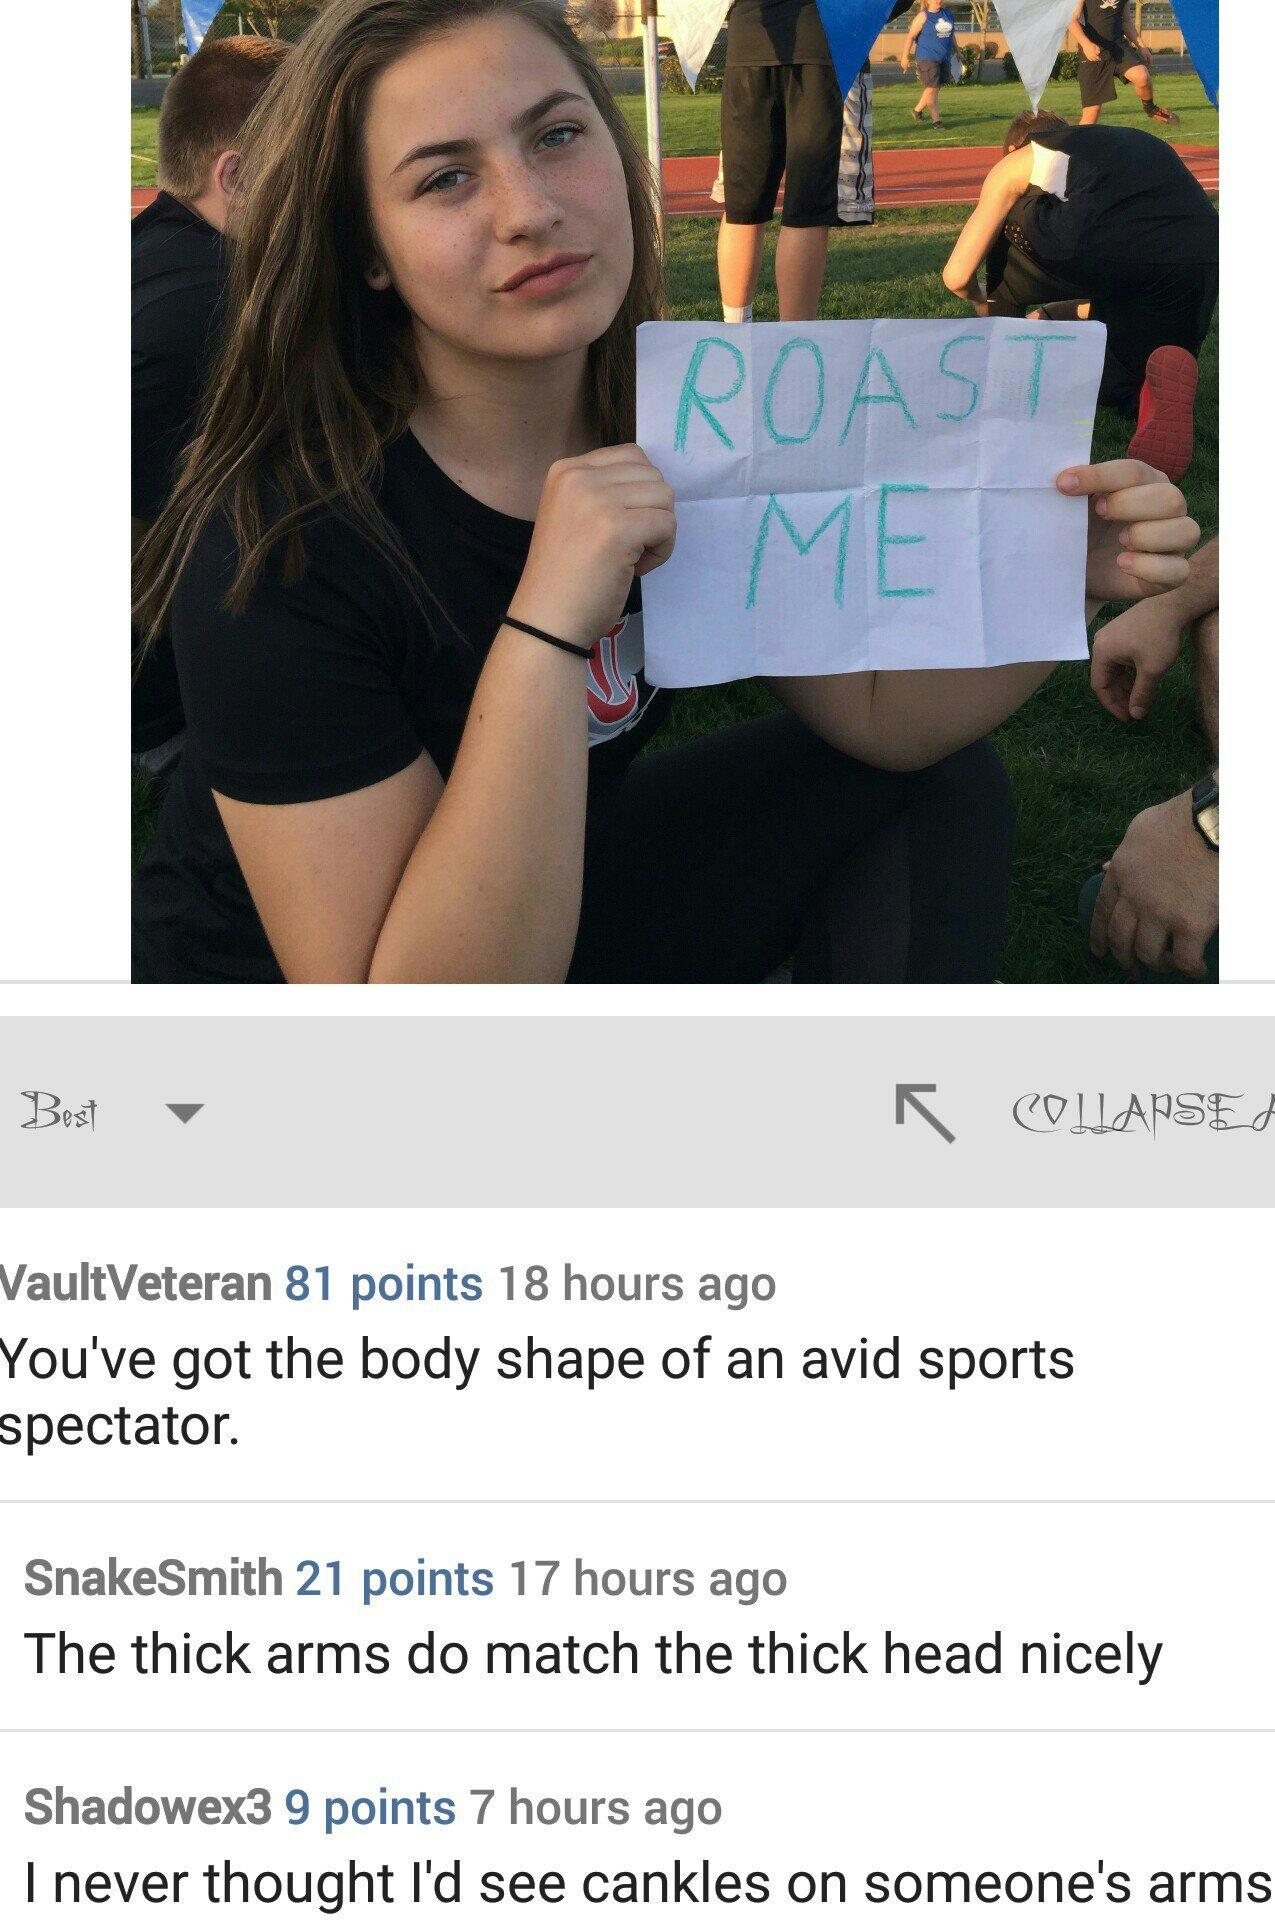 Gotta love roast me - meme